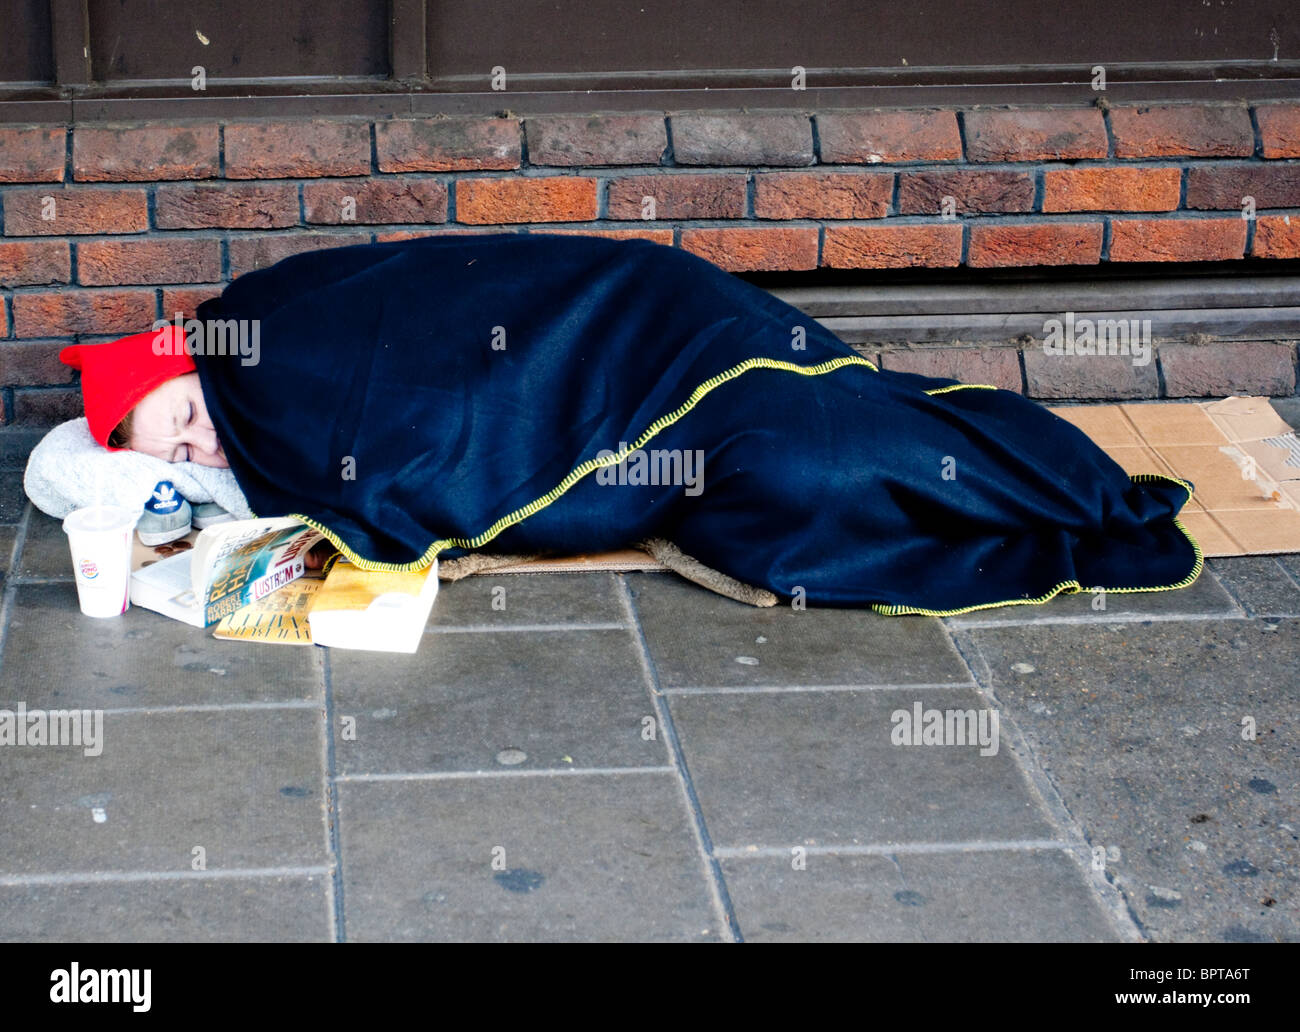 Homeless person sleeping rough, London, England, UK - Stock Image